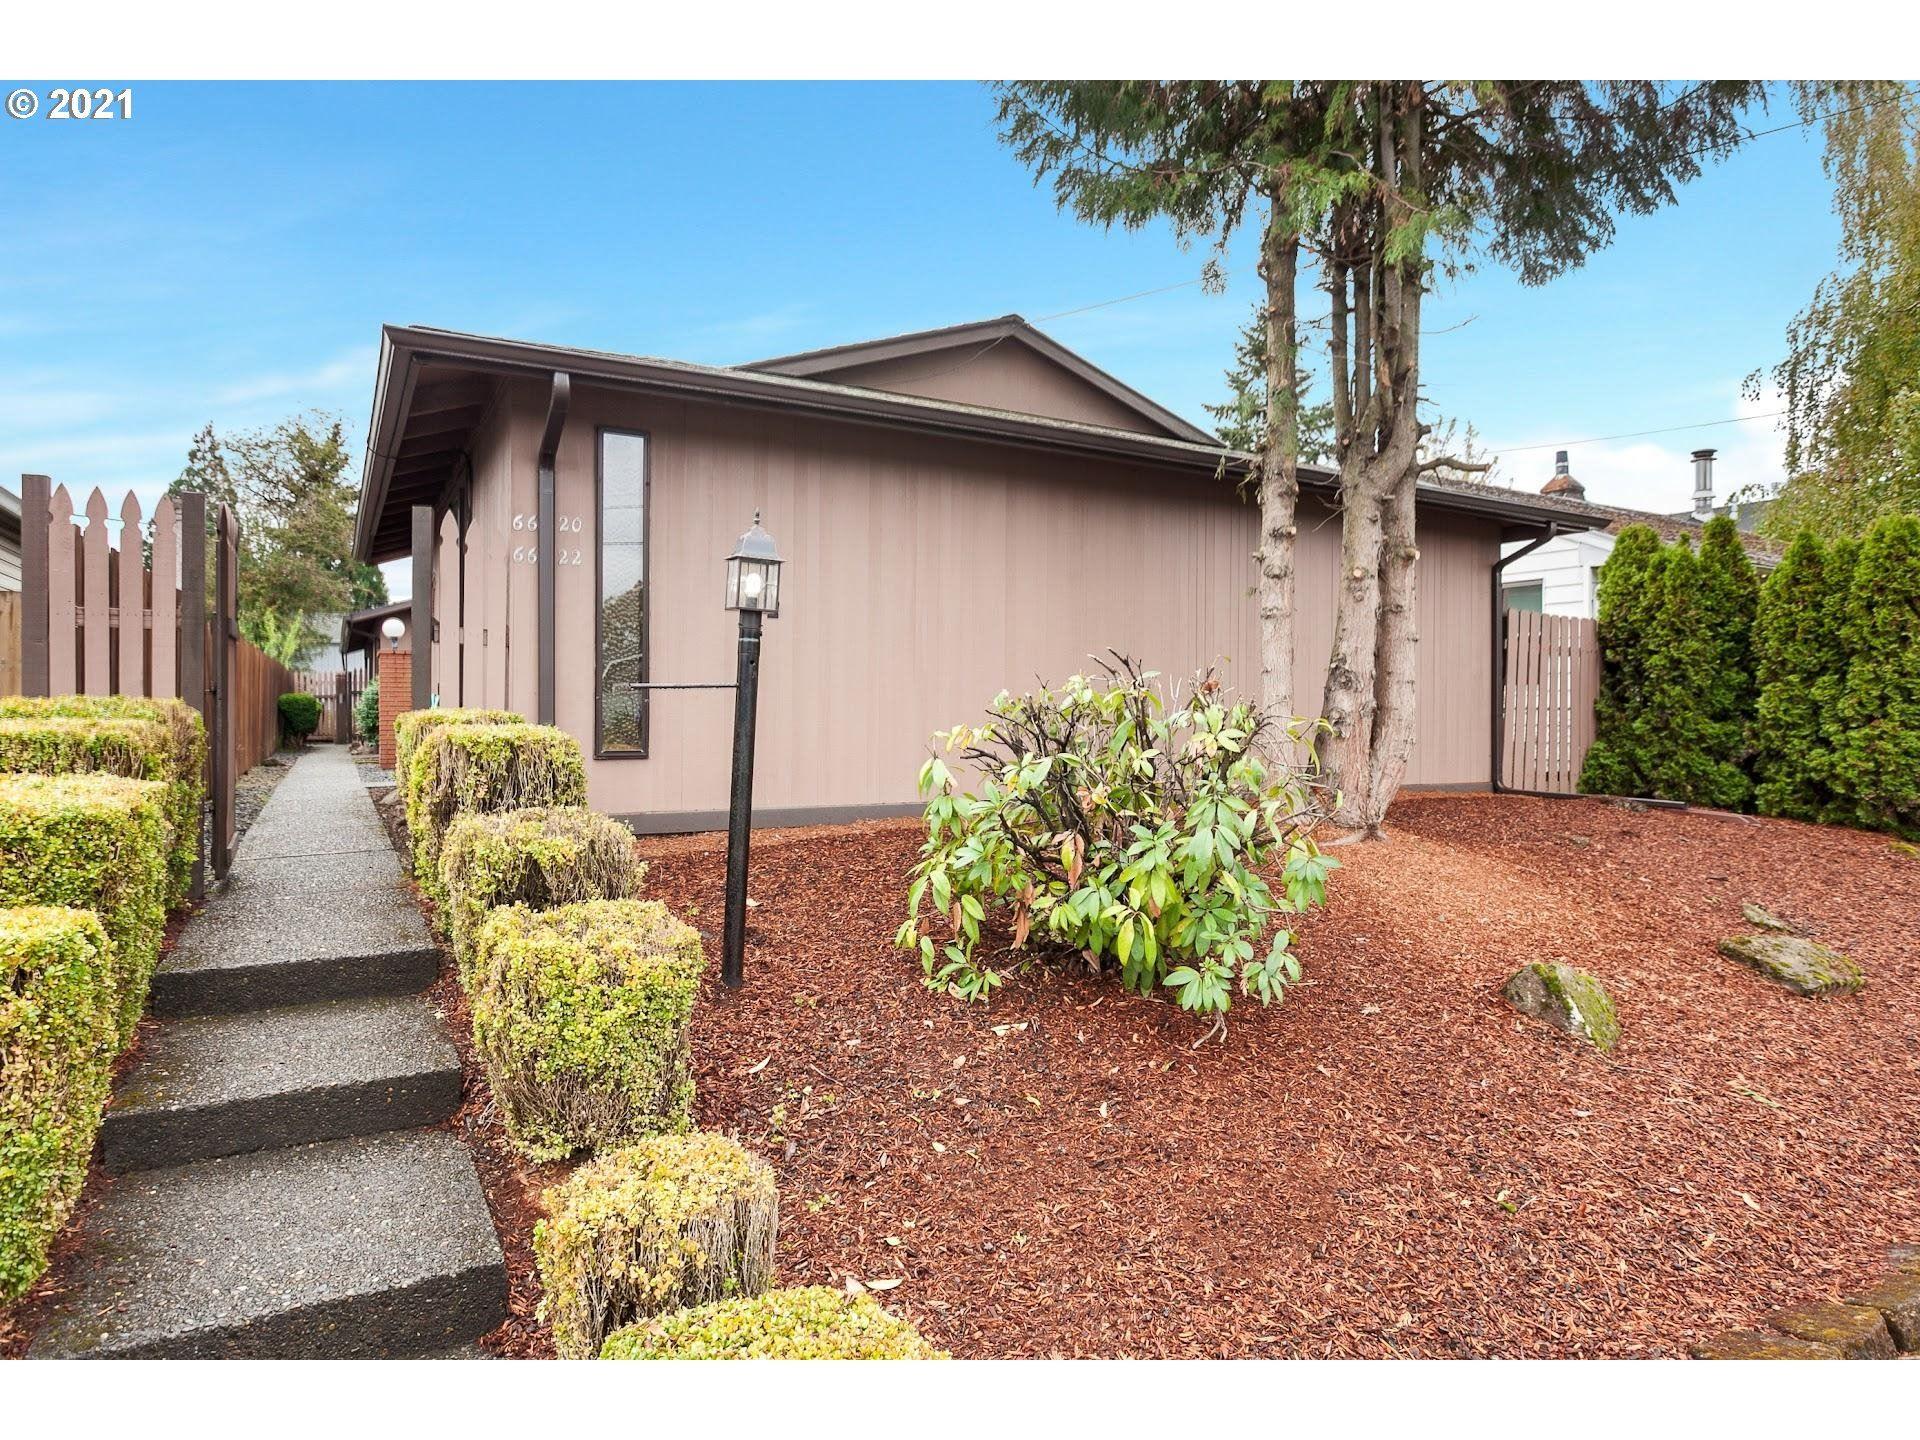 6620 SE WOODSTOCK BLVD, Portland, OR 97206 - MLS#: 21333158